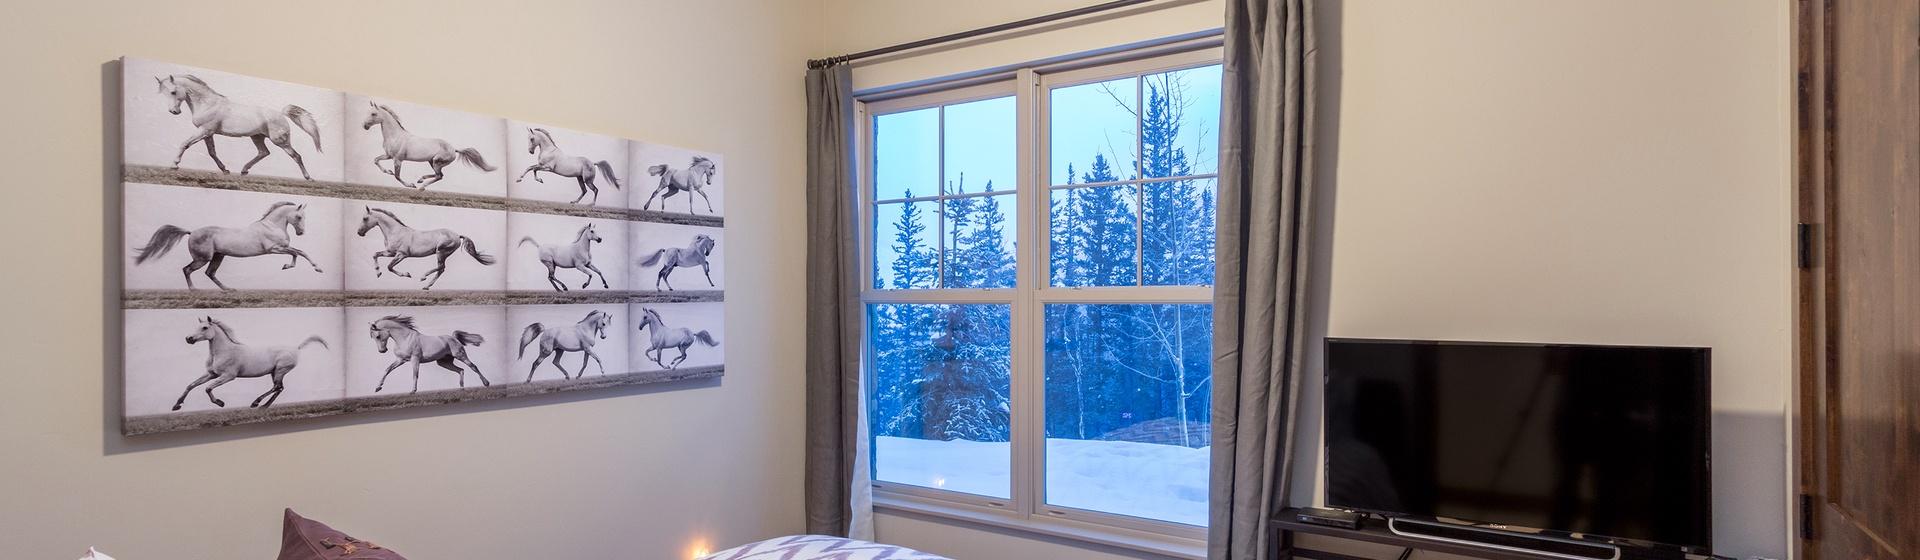 15-Telluride-Cassidy-Ridge-A103-Bedroom-4-Web.jpg